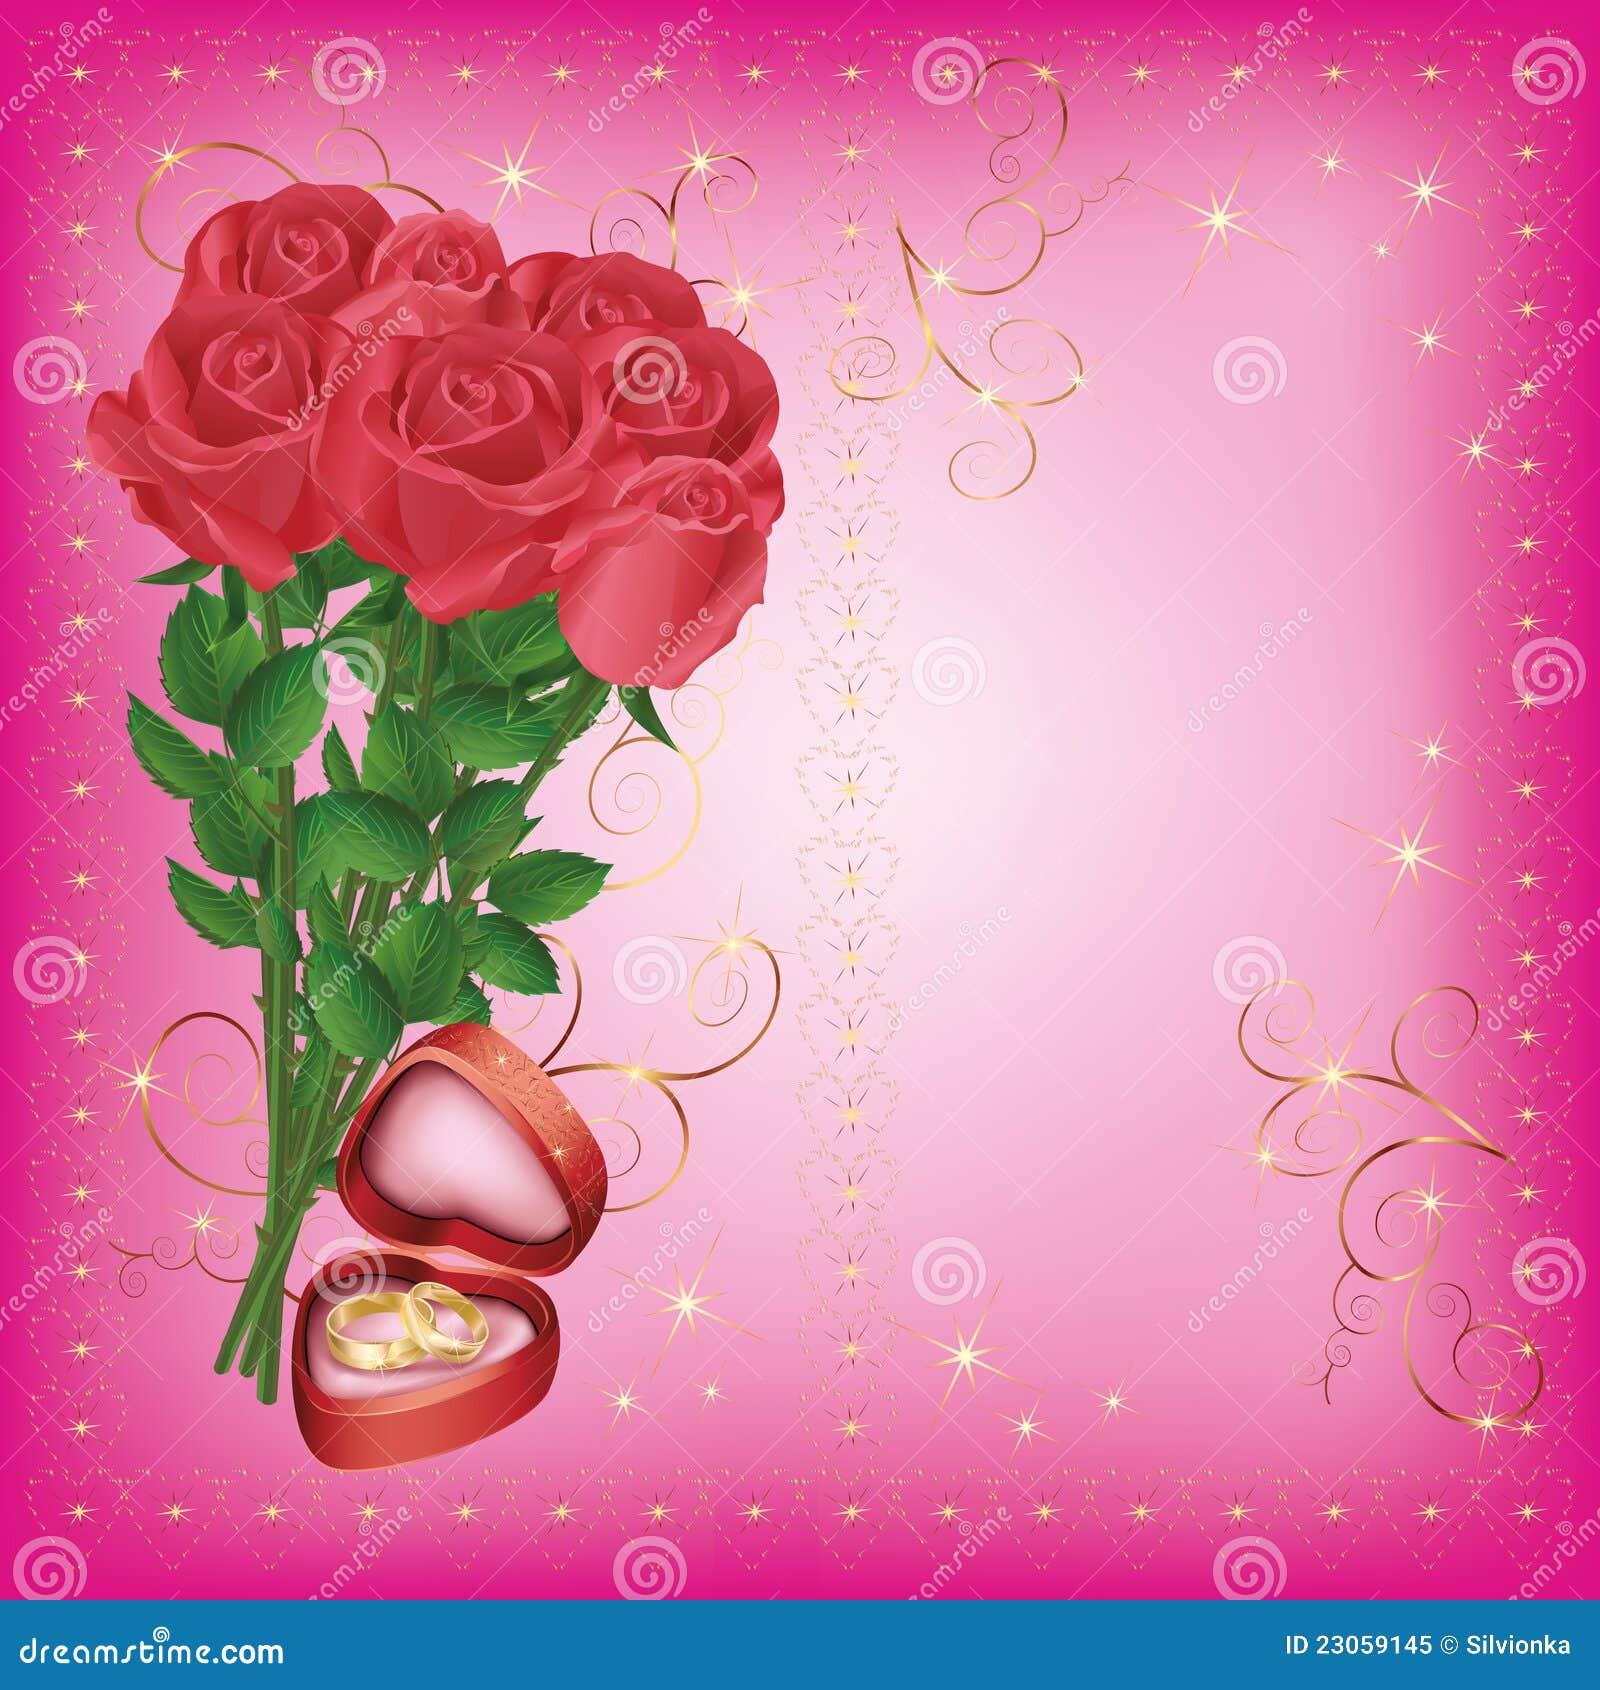 wedding greeting and invitation card royalty free stock